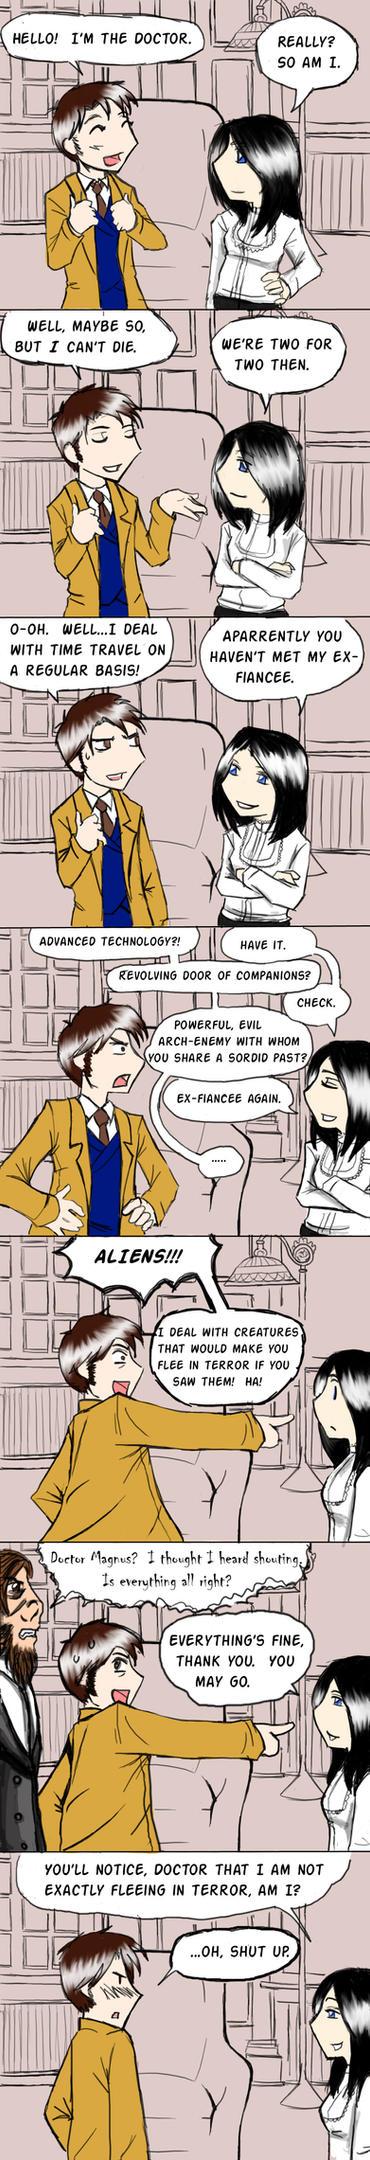 DOCTOR BATTLE by SuperherogirlCat